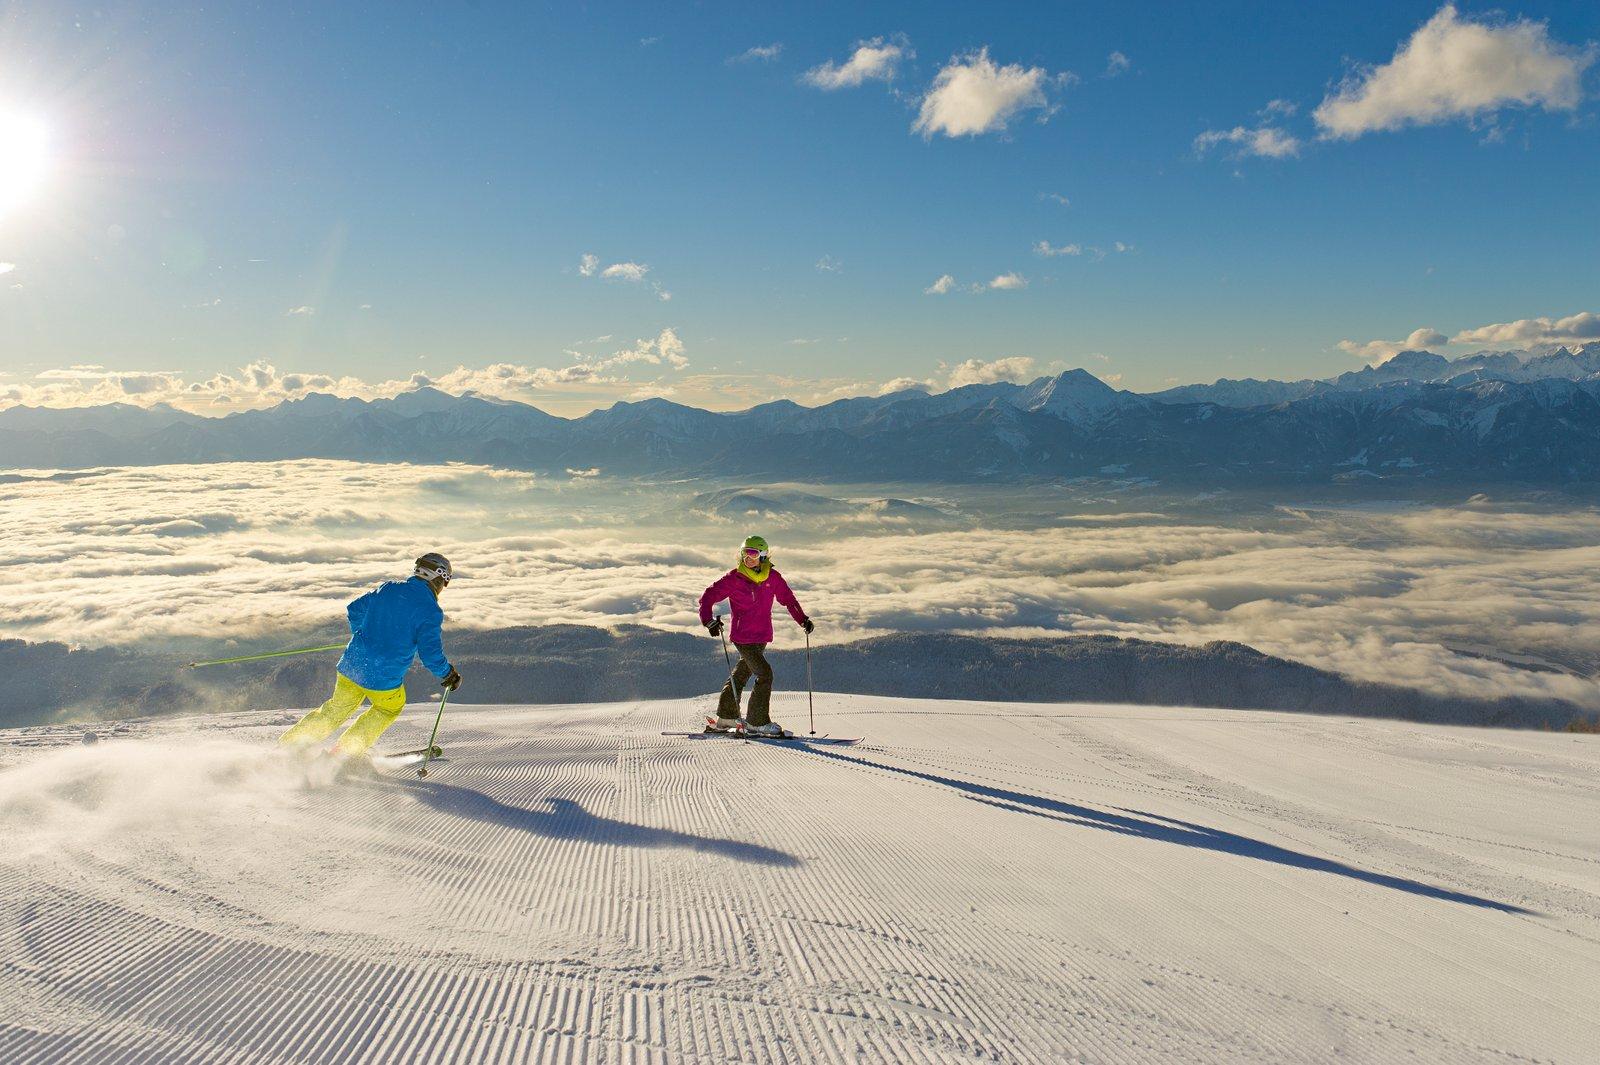 1-Kaernten Werbung_Gerlitzen Alpe_Skifahren_Franz Gerdl